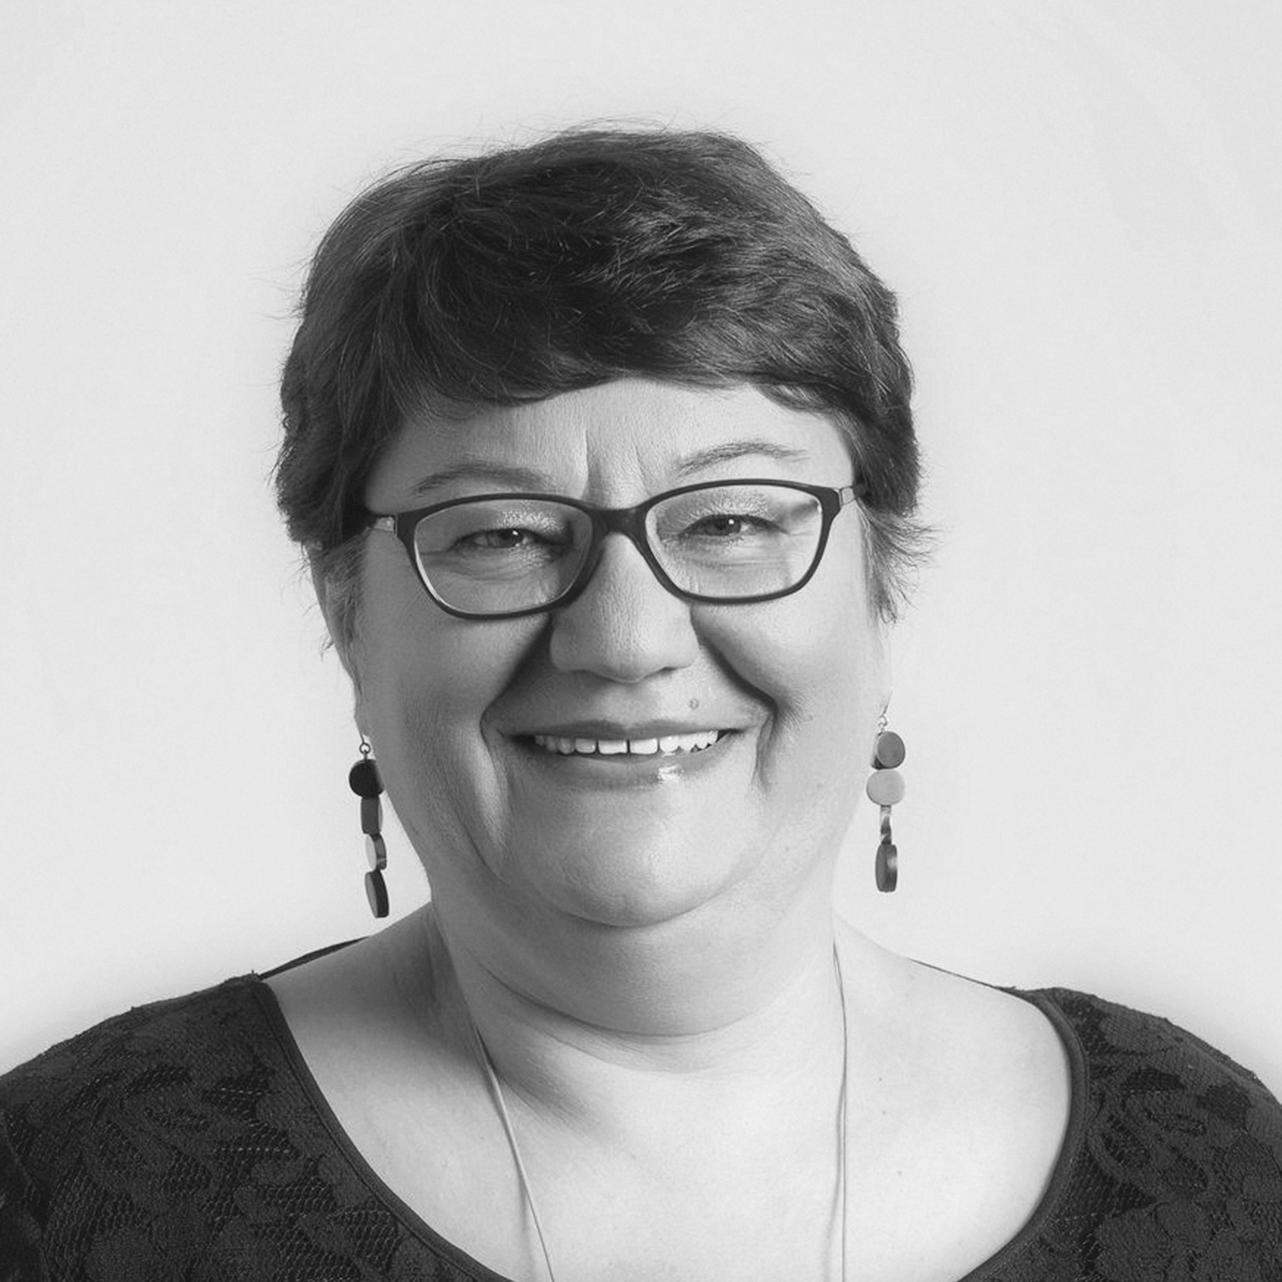 A photo of Margaret Maljkovic